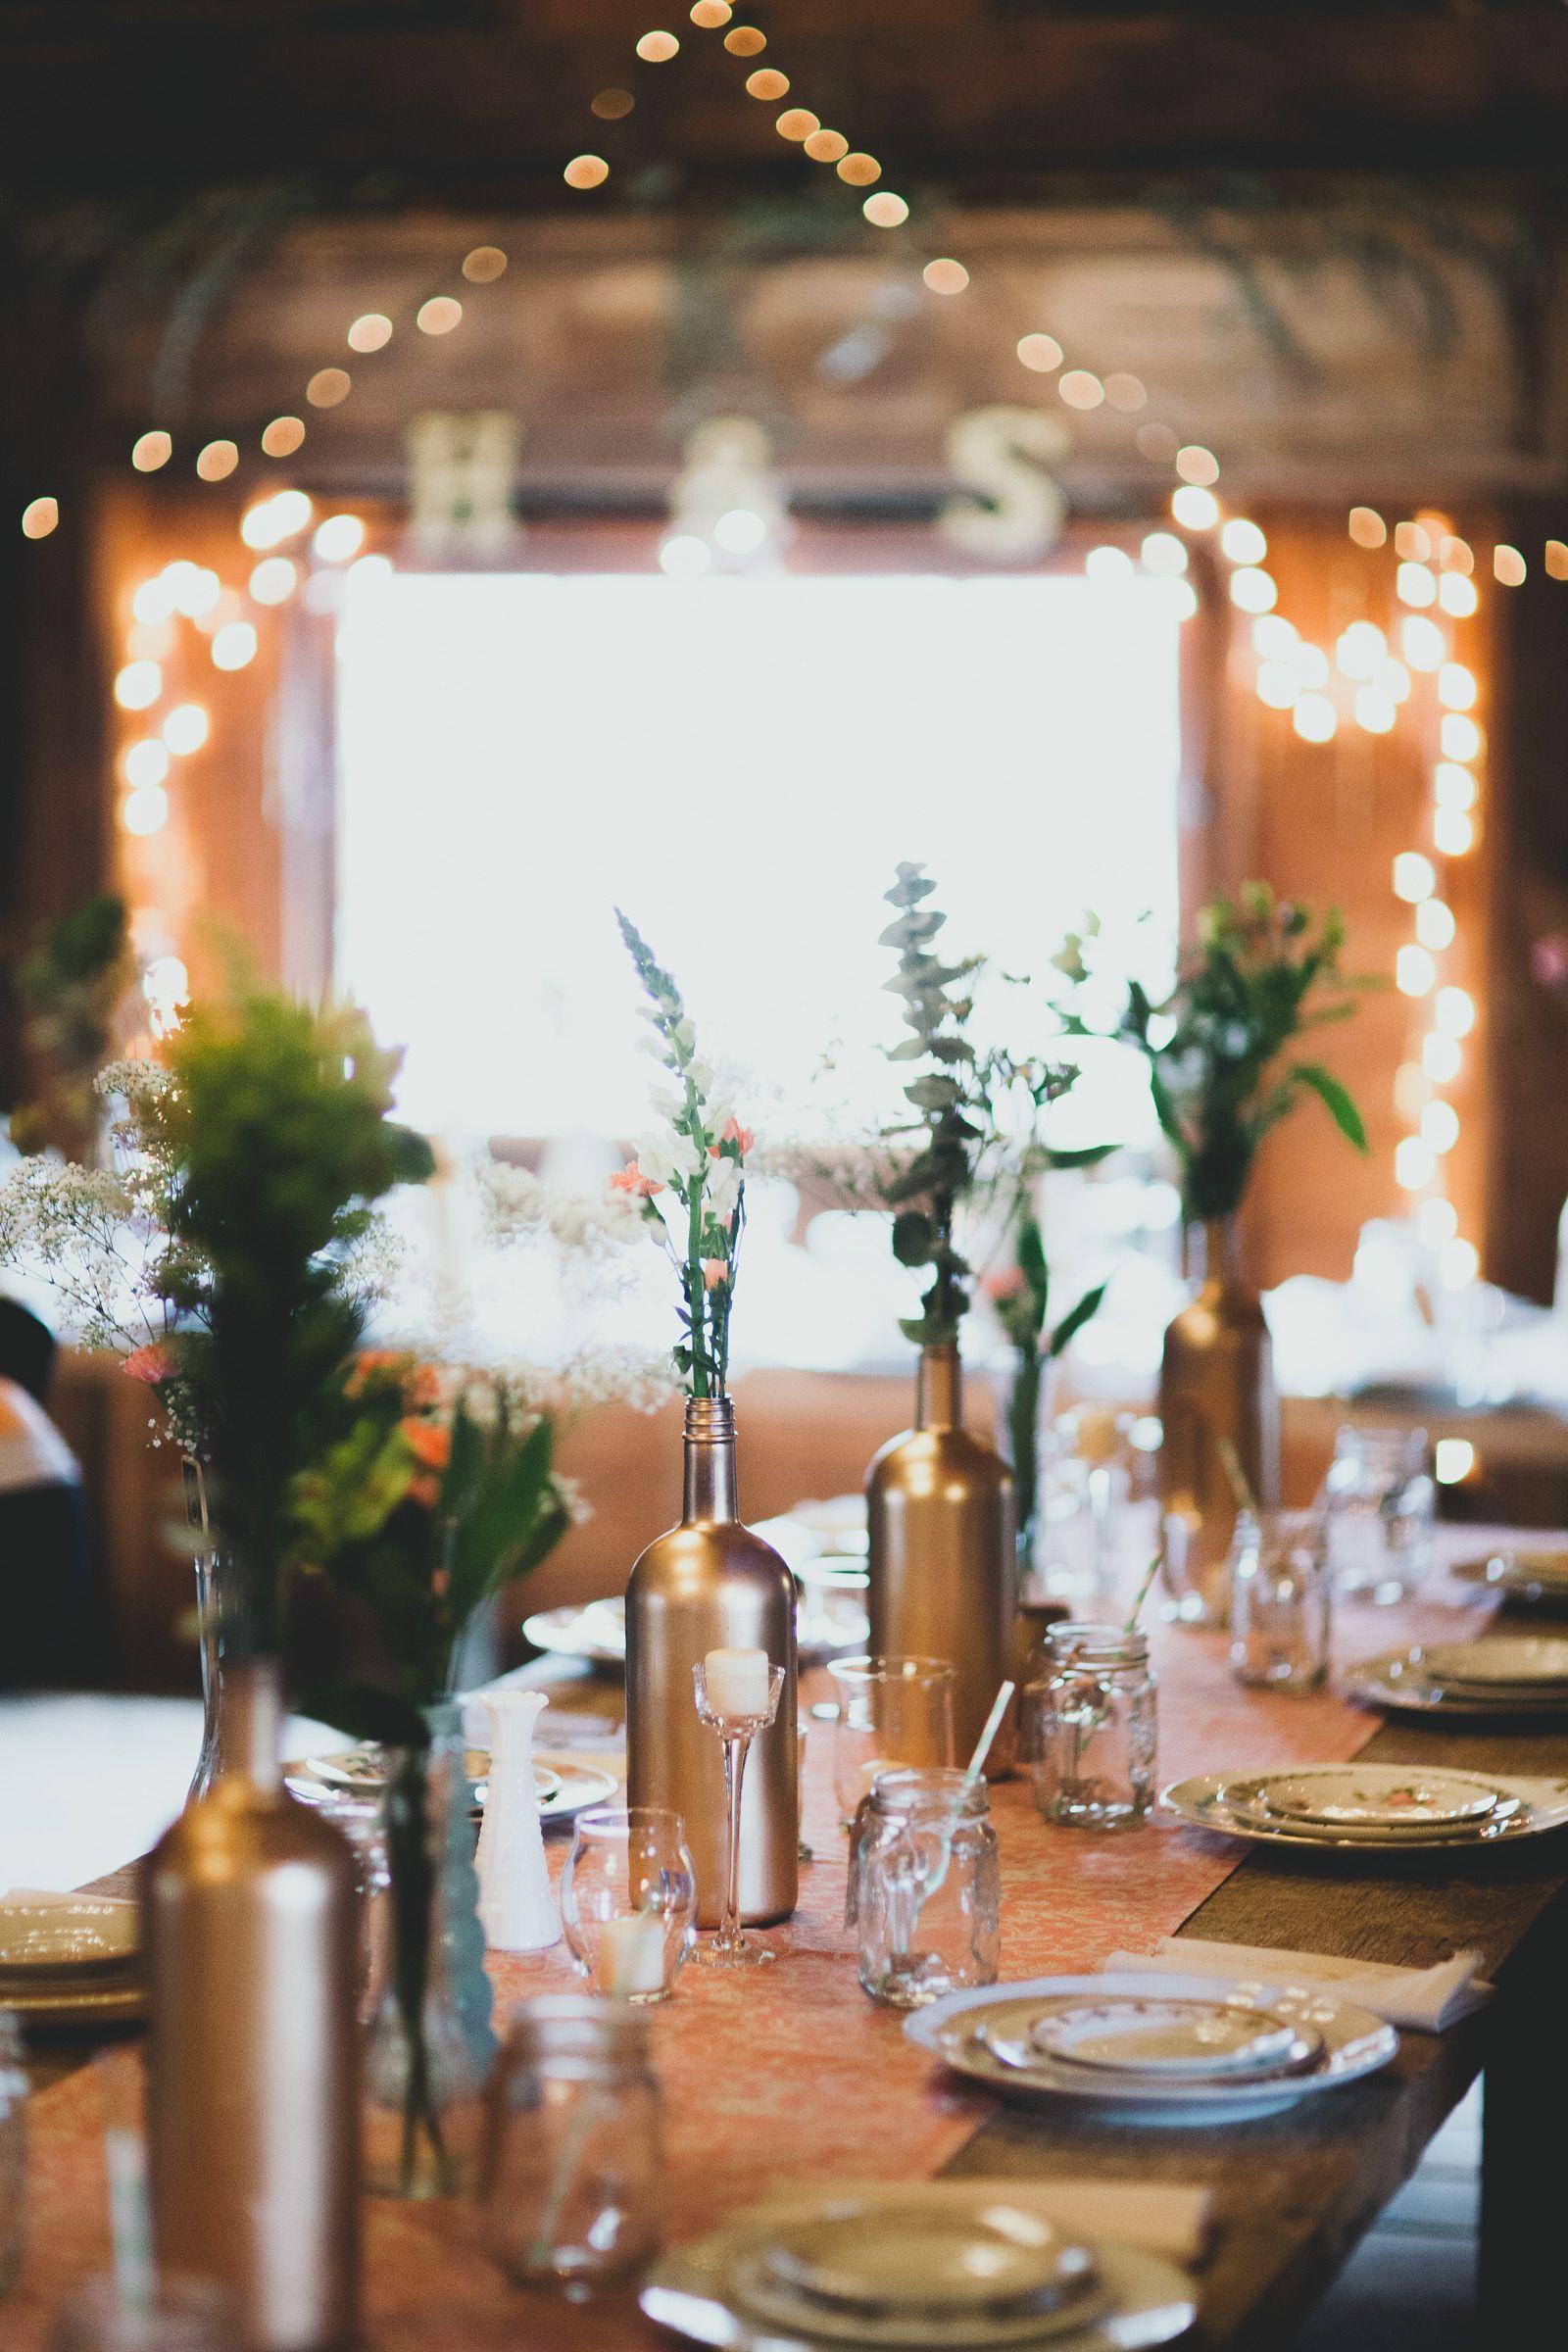 New jersey rustic barn wedding pinterest rustic style weddings rustic style wedding decorations junglespirit Image collections